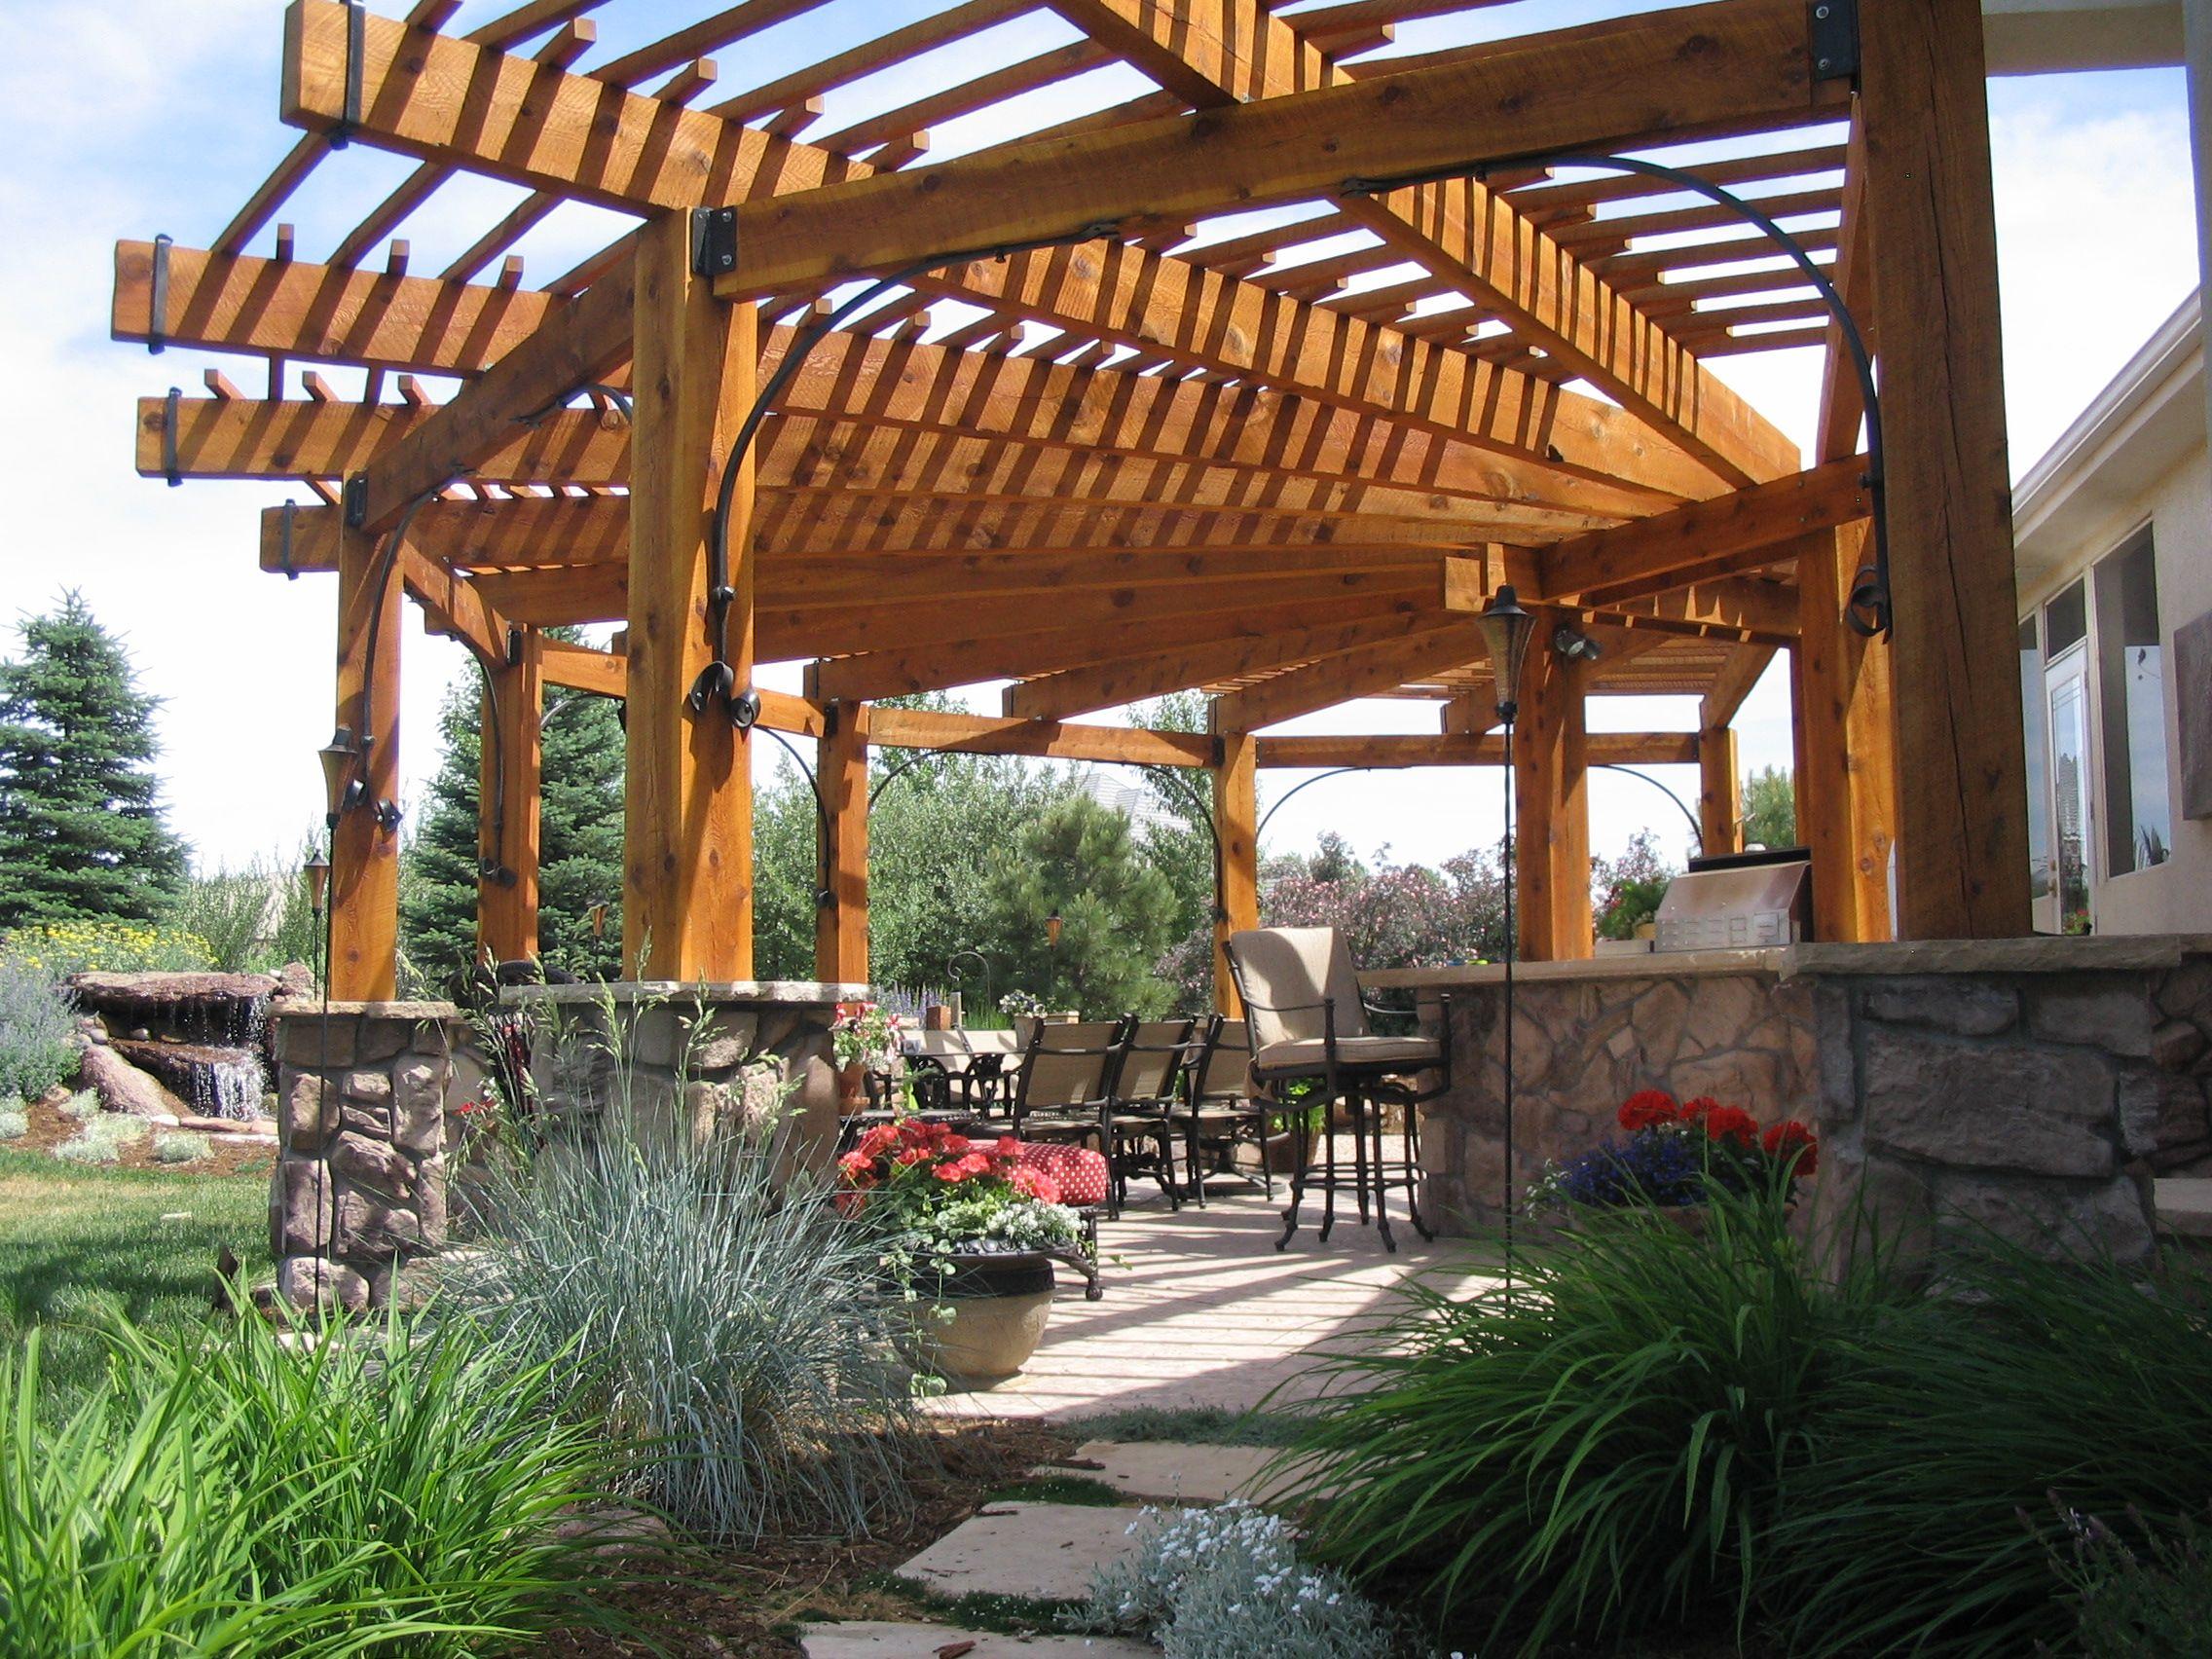 Captivating Wood Pergola, Natural Stone Columns, Outdoor Rooms, Landscape